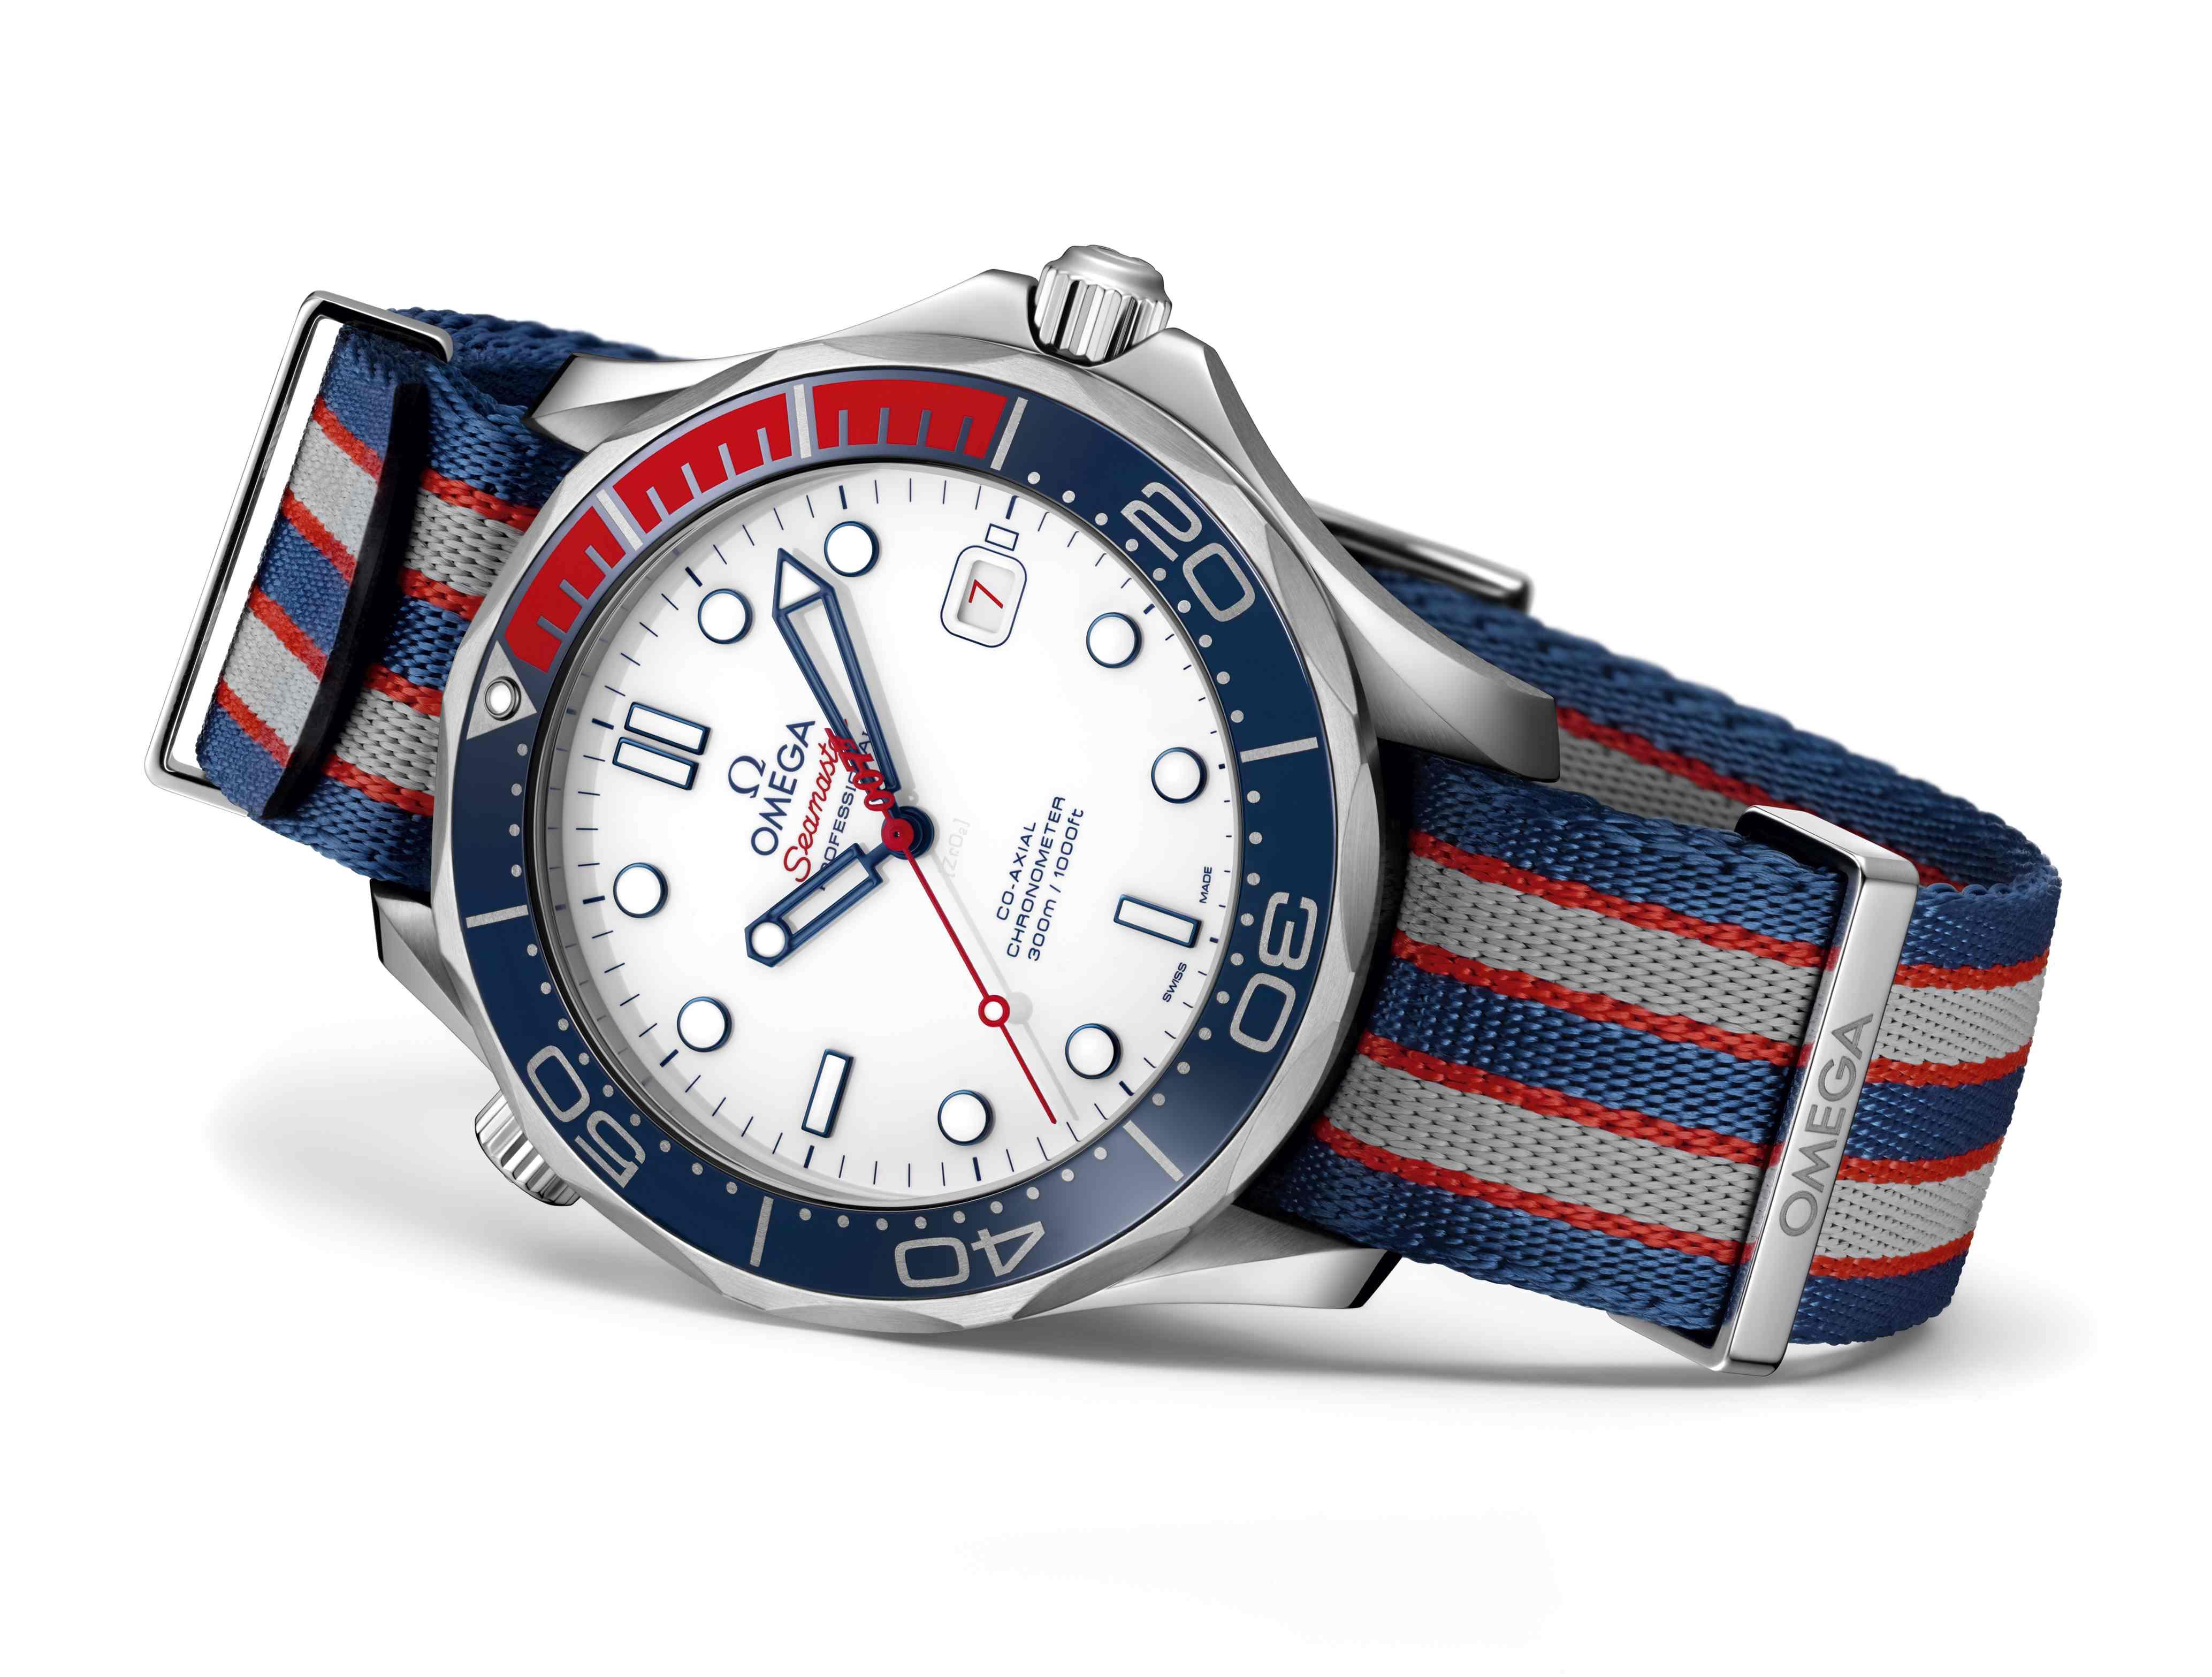 Omega_SeamasterDiver300_CommandersWatch_LE_212.32.41.20.04.001_Nato bracelet